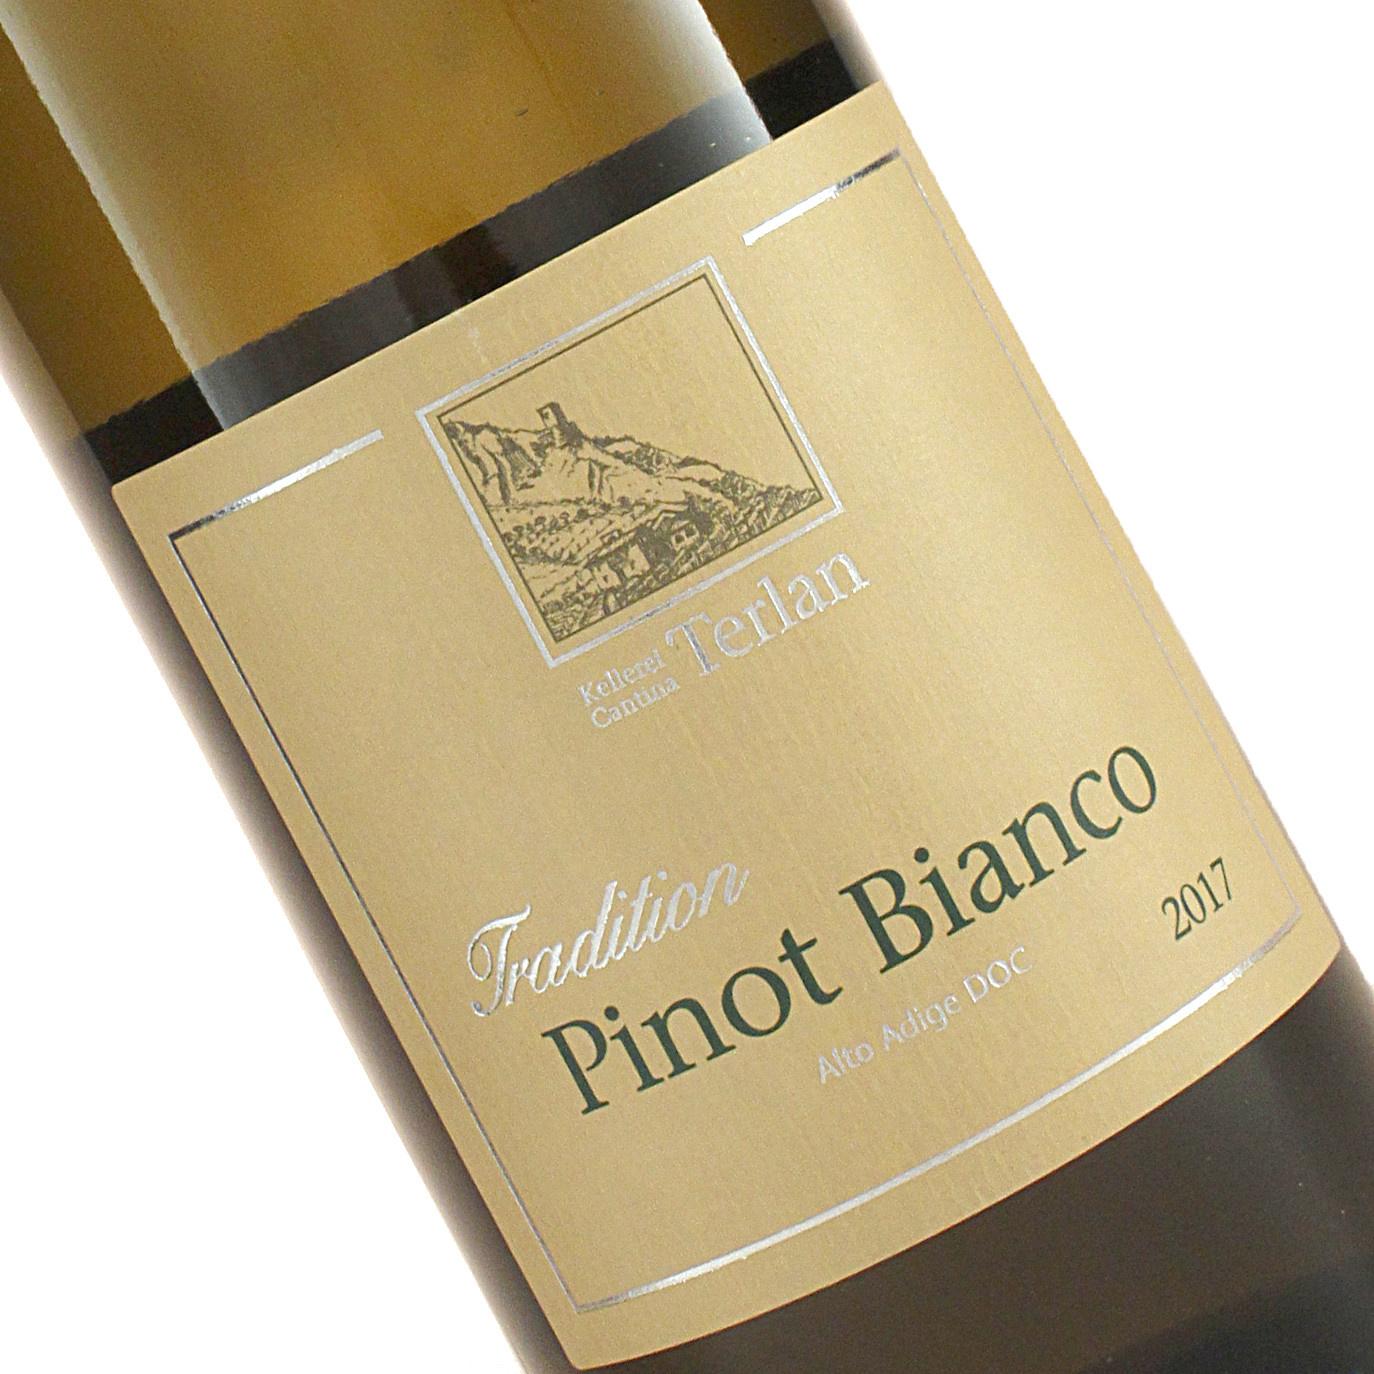 Cantina Terlano 2018 Pinot Bianco, Sudtirol-Alto Adige Italy